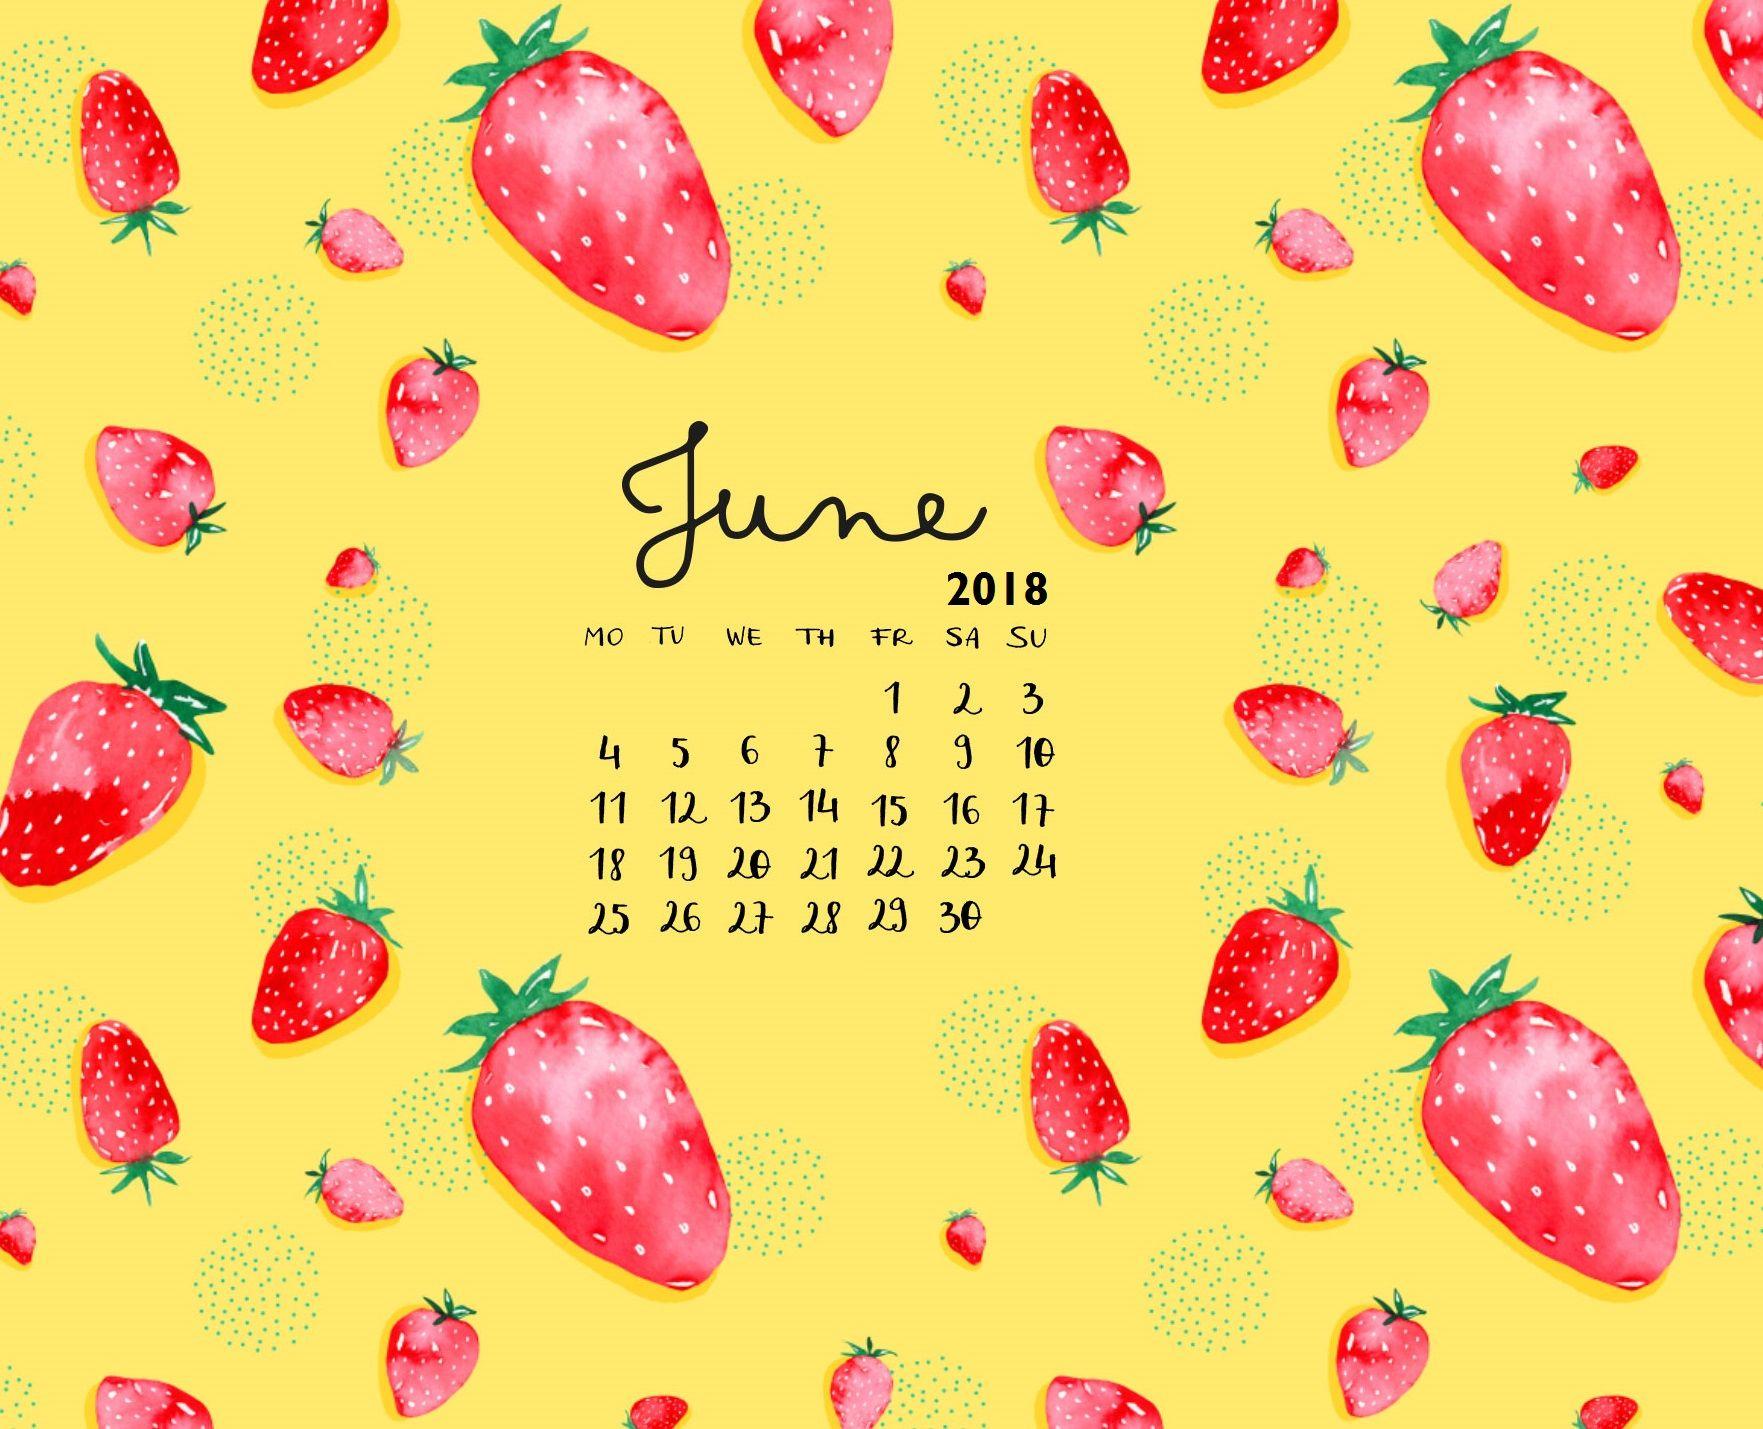 Cute June 2018 iPhone Calendar Calendar wallpaper, June